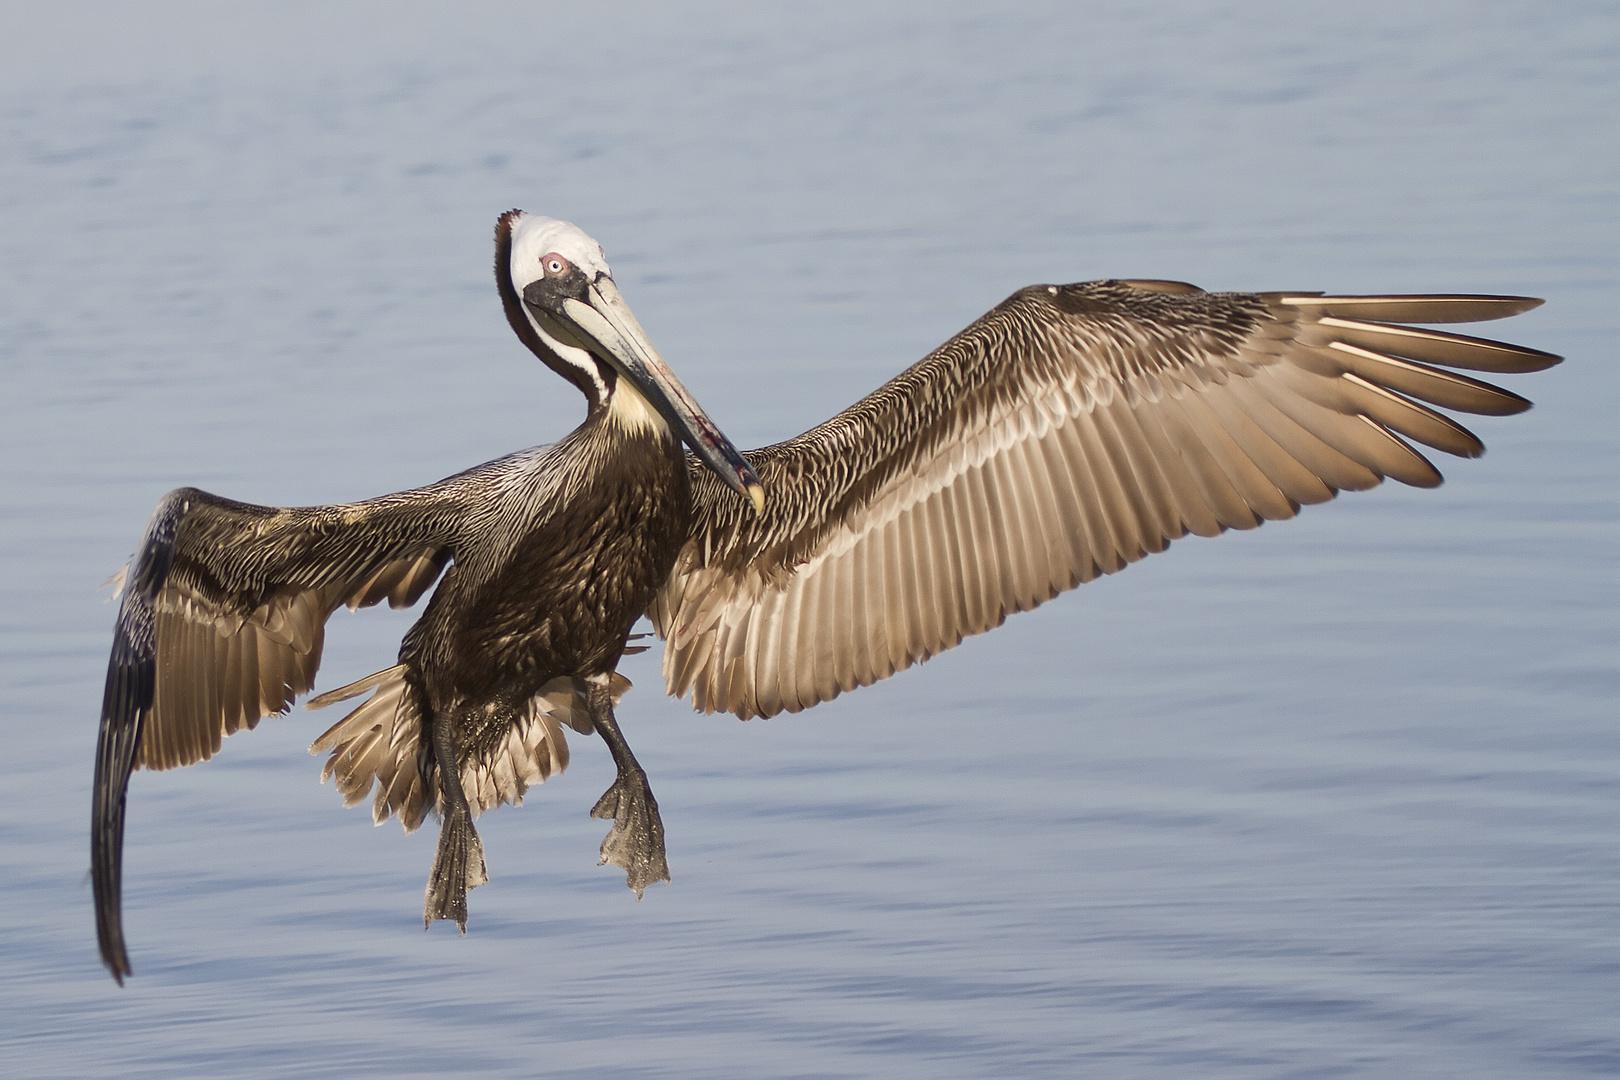 Brauner Pelikan im Anflug